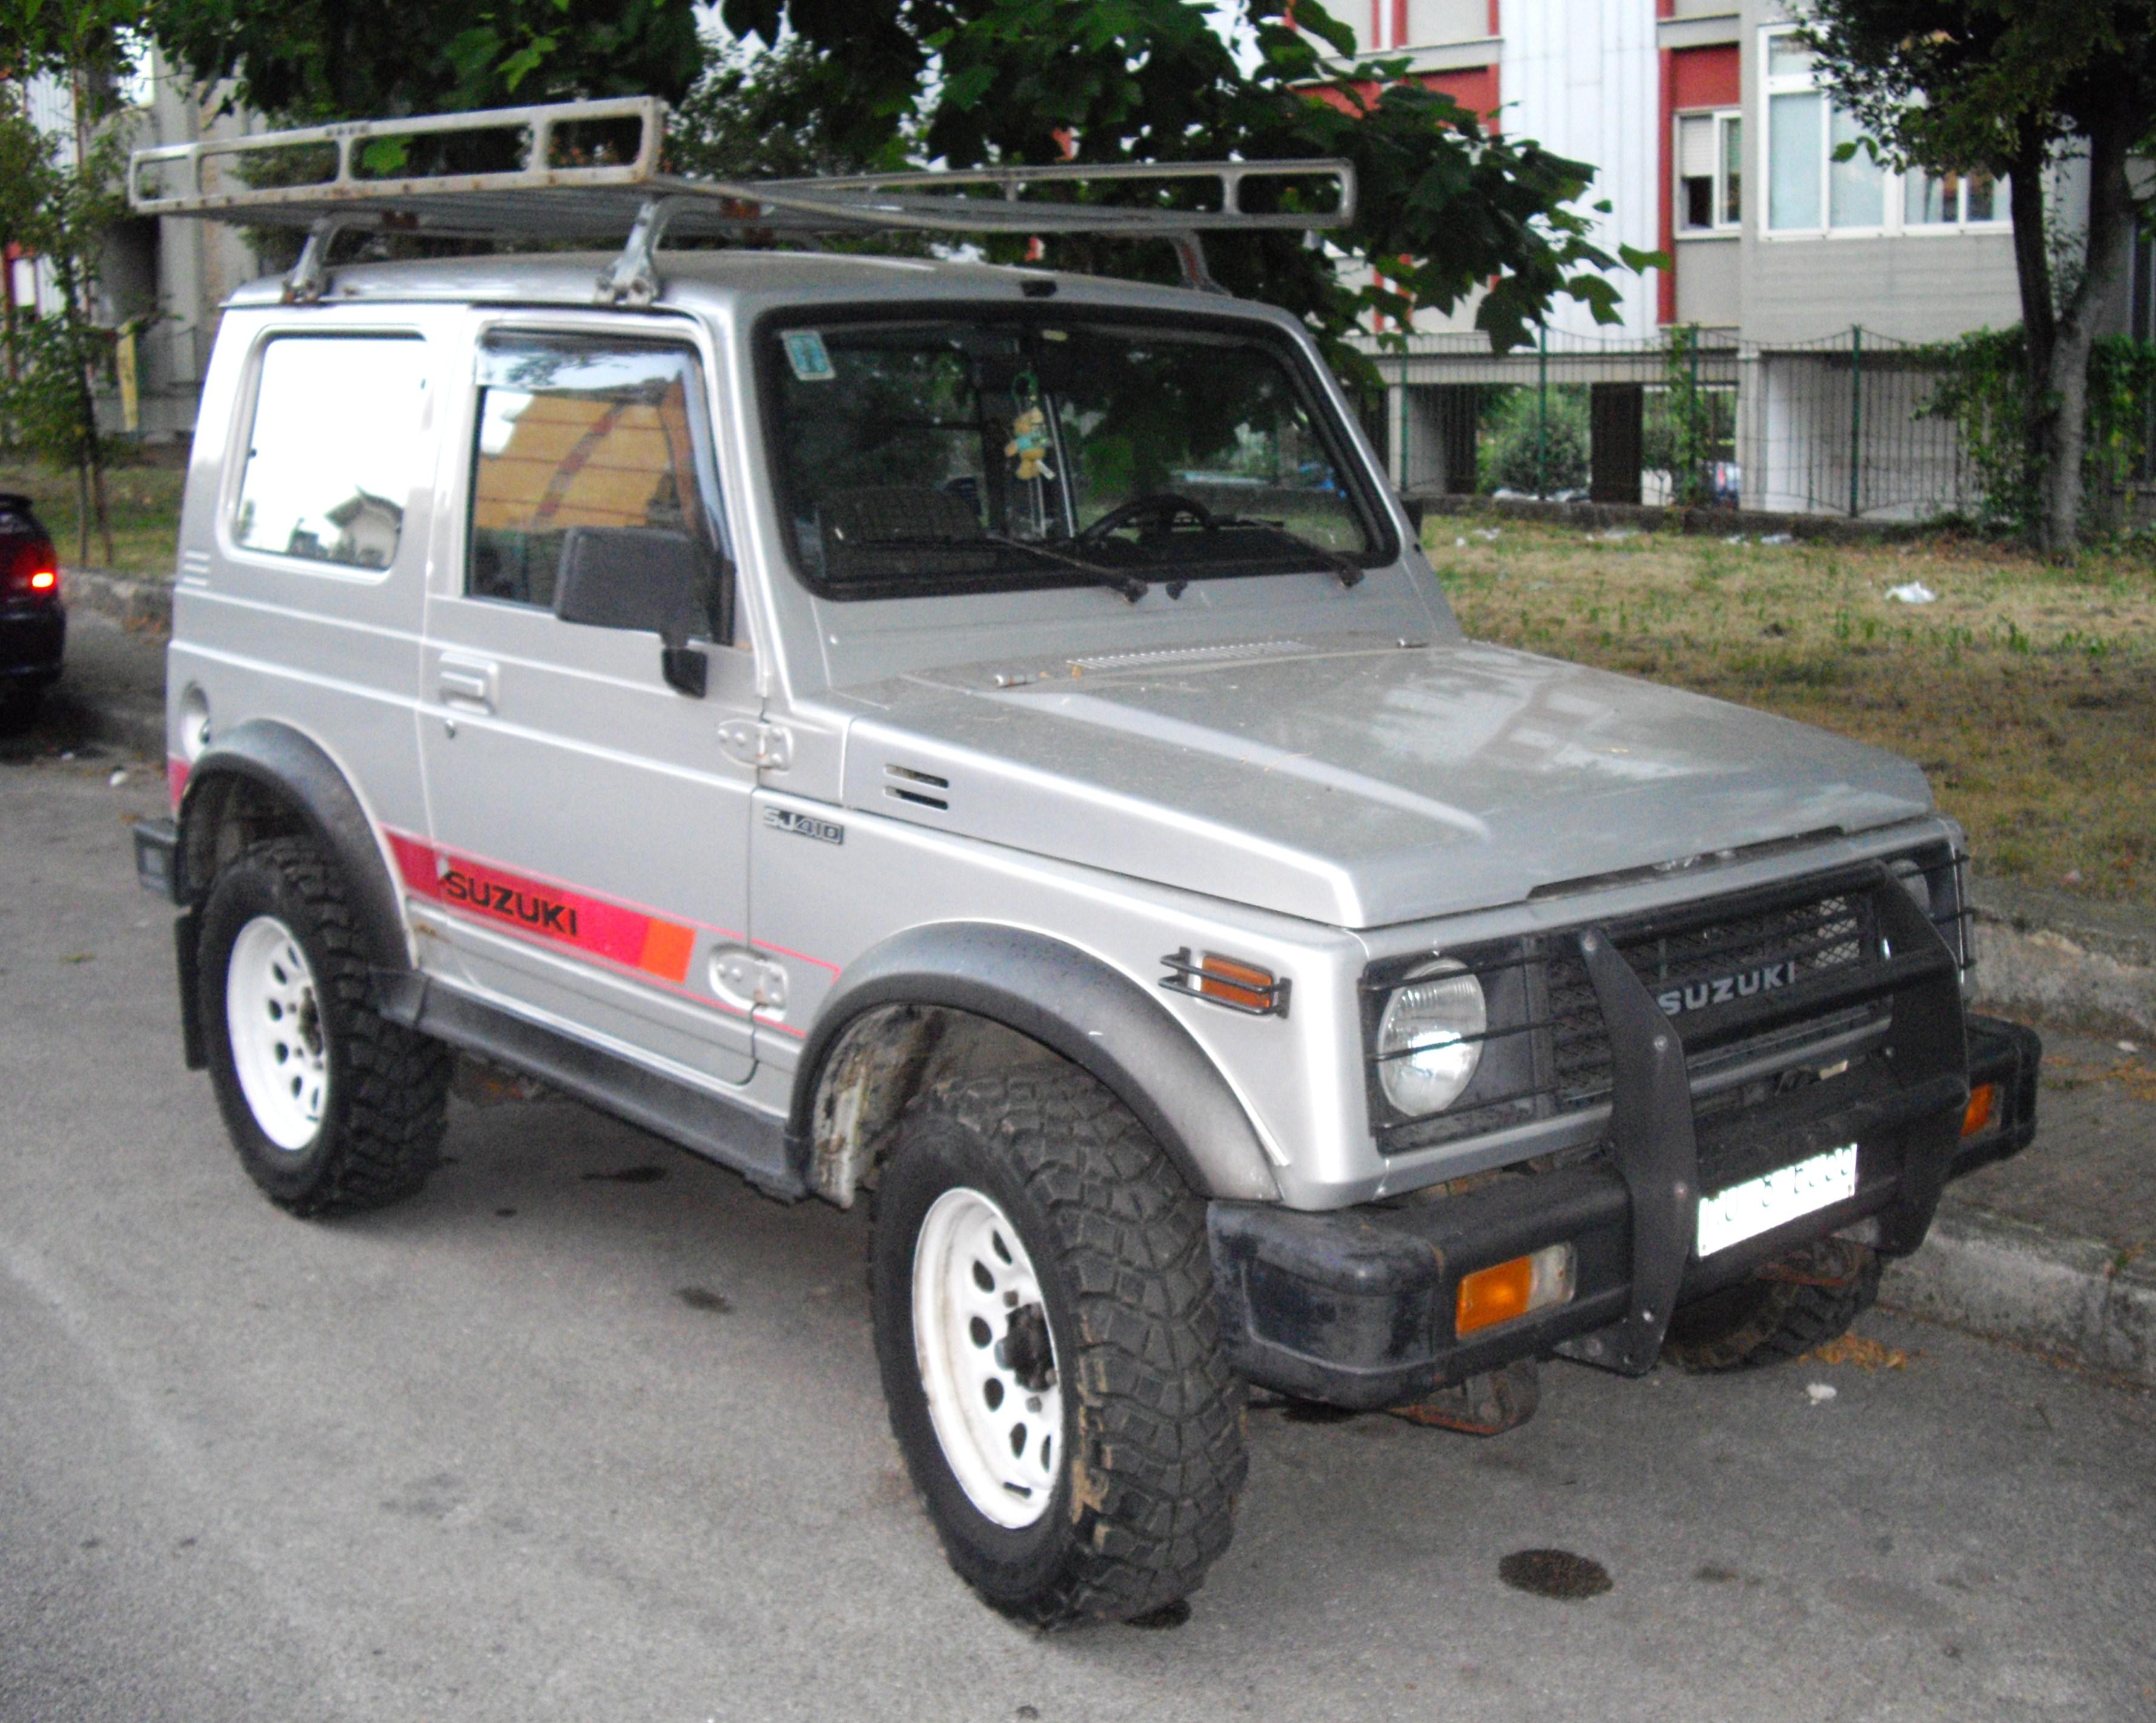 Suzuki Fj